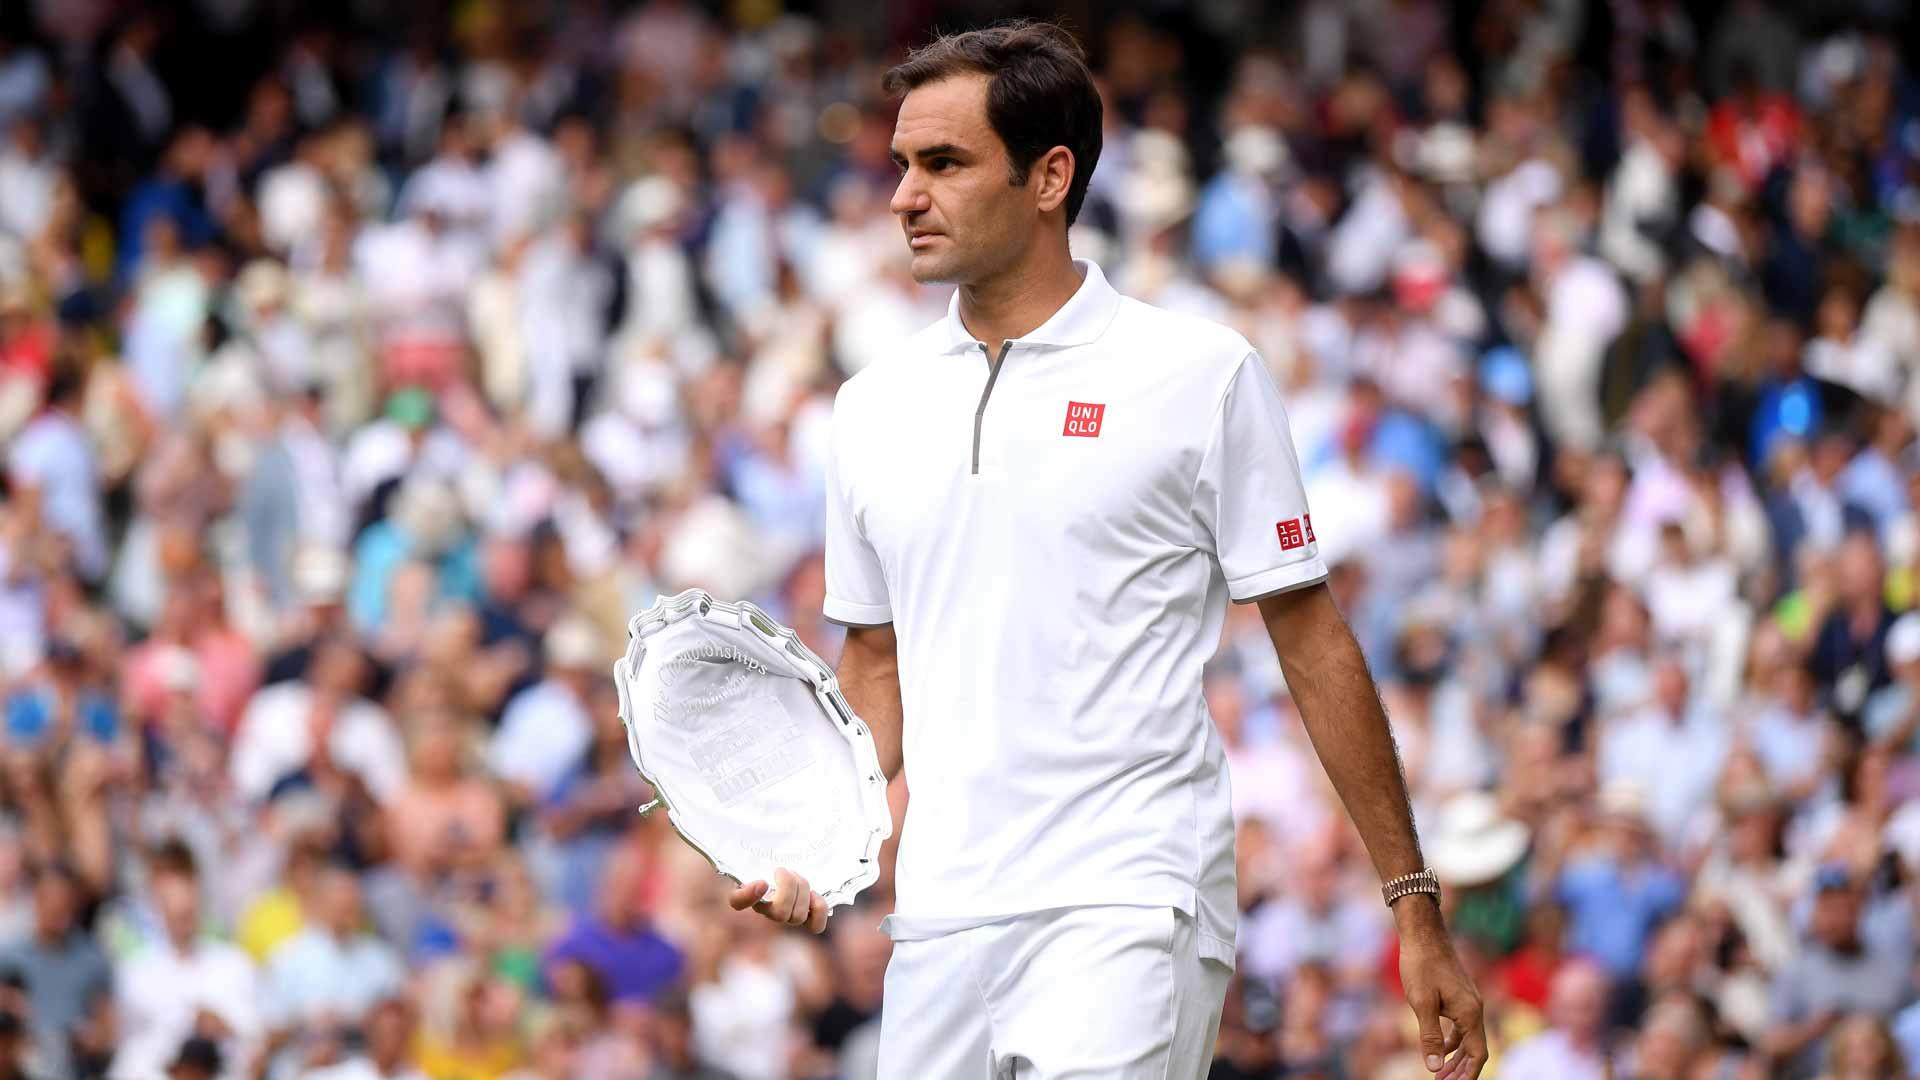 Wimbledon Live Stats